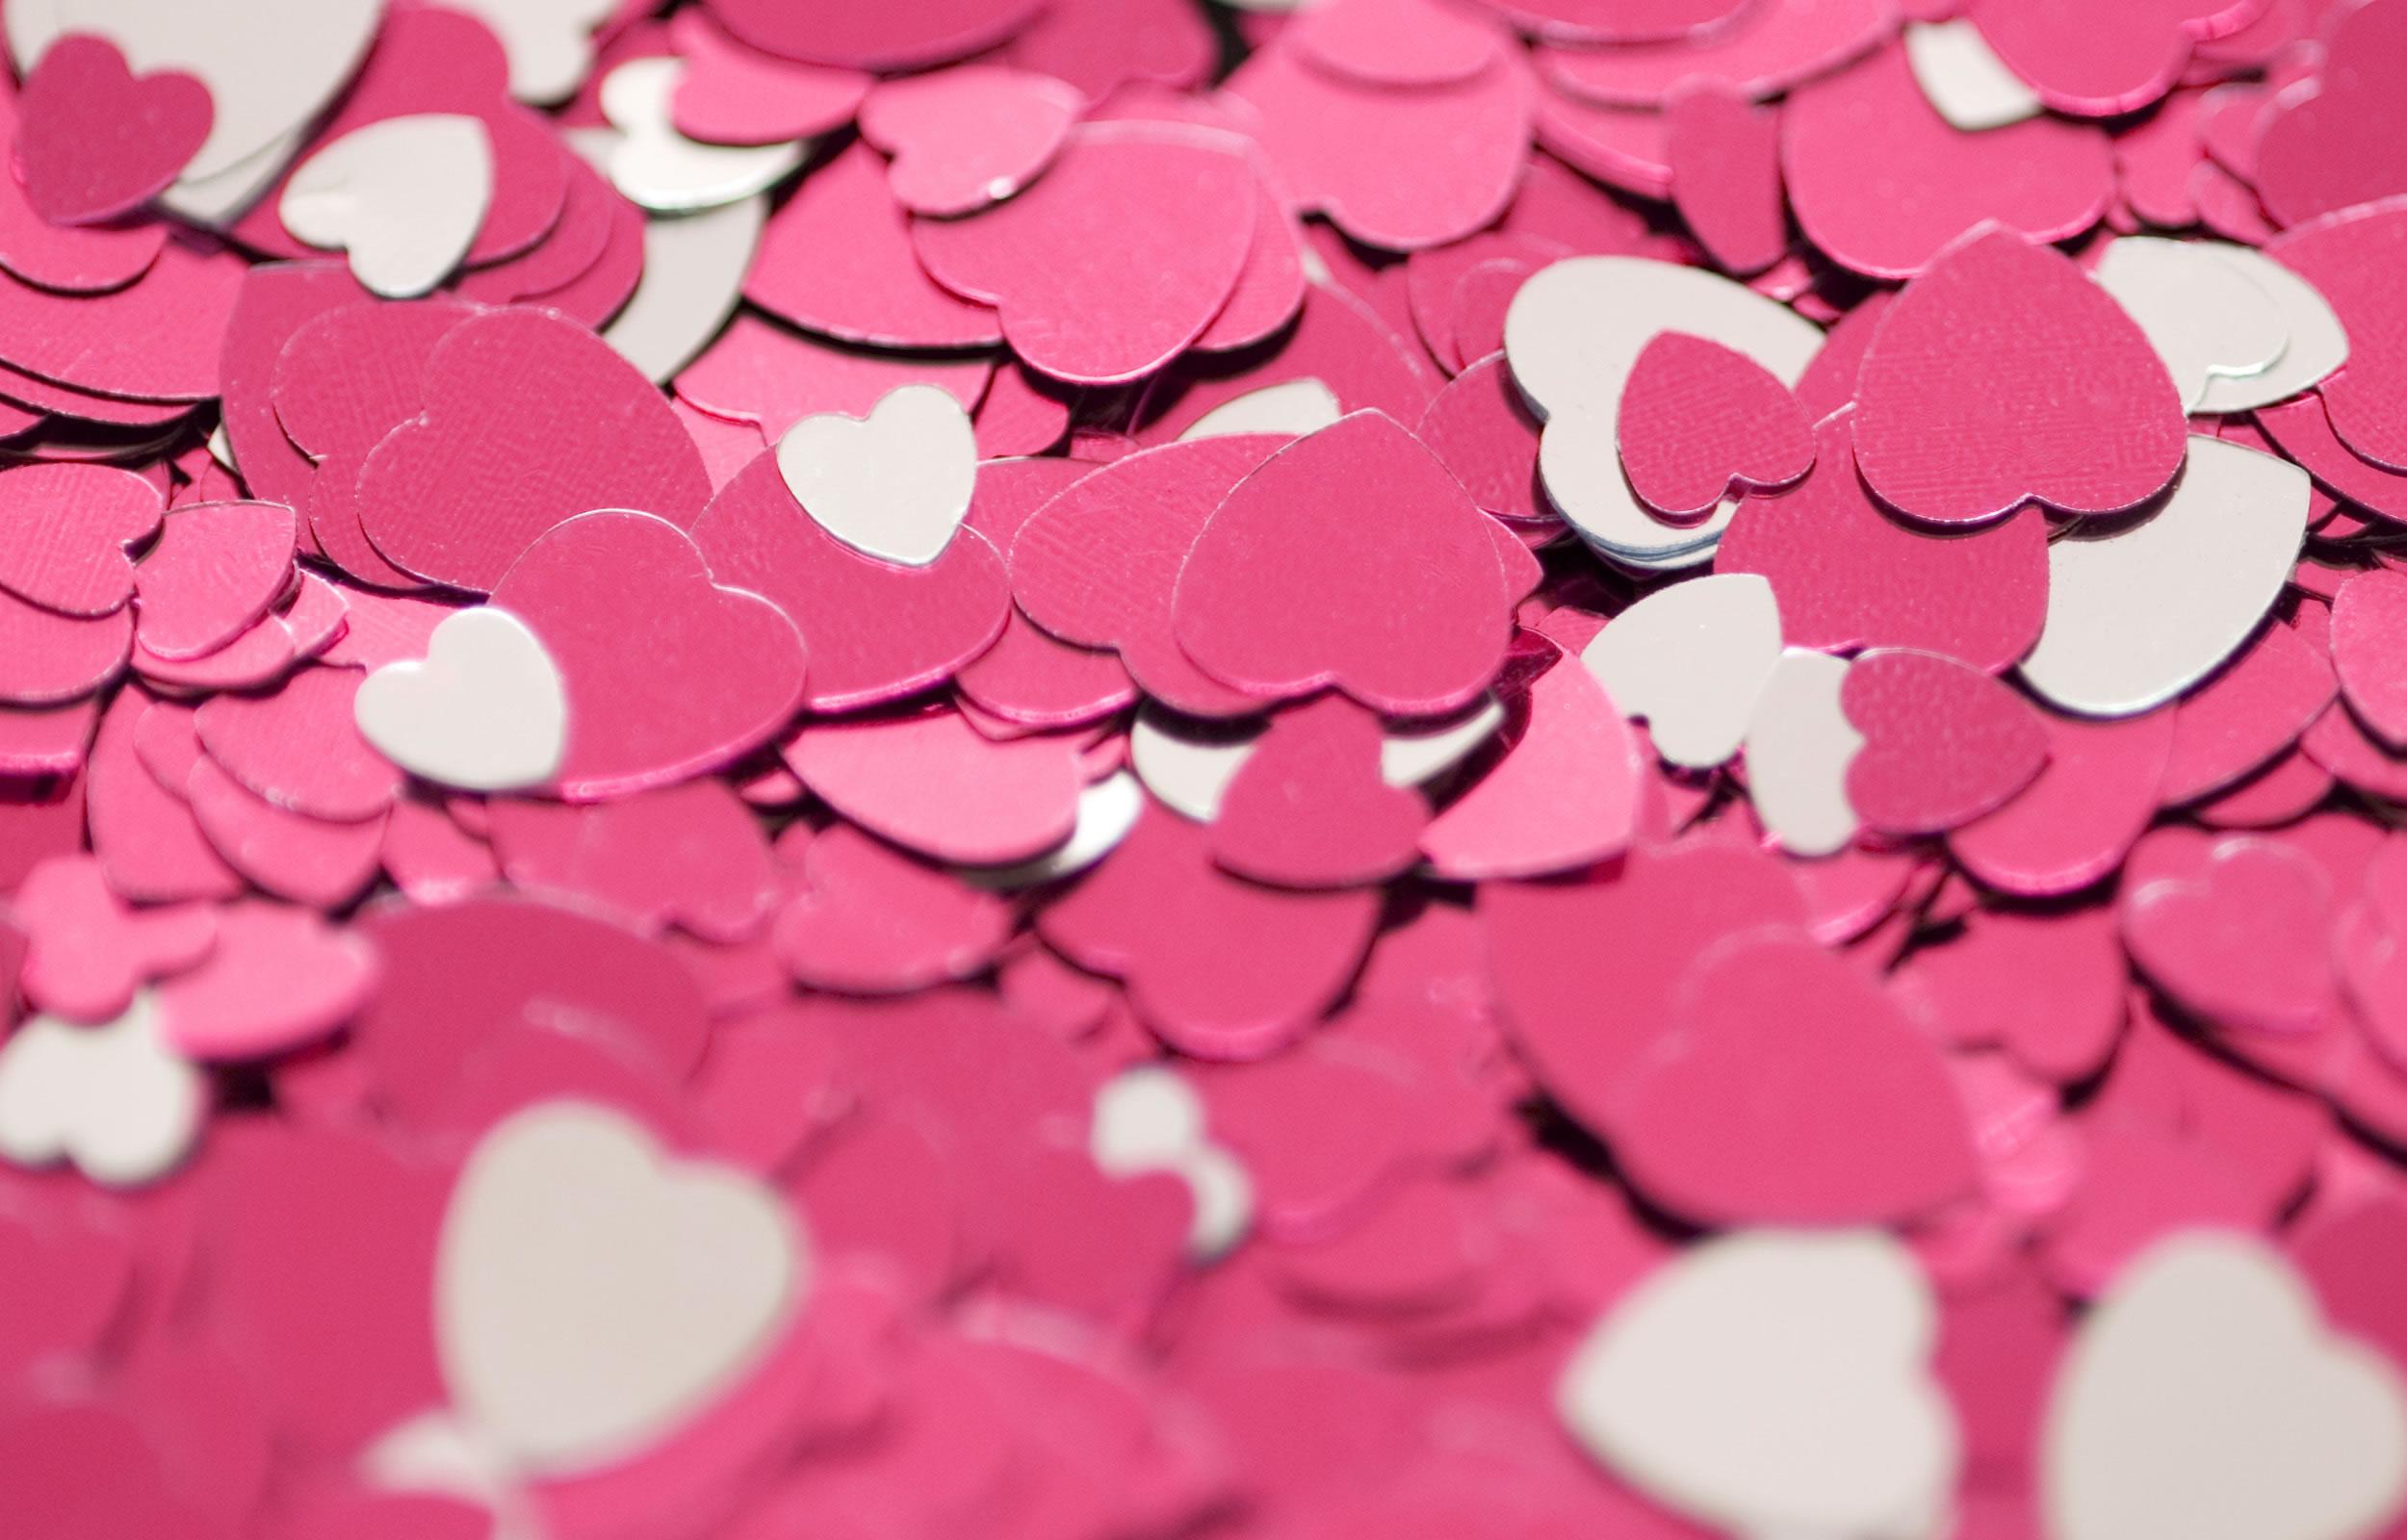 download wallpaper: Valentijnsdag wallpaper